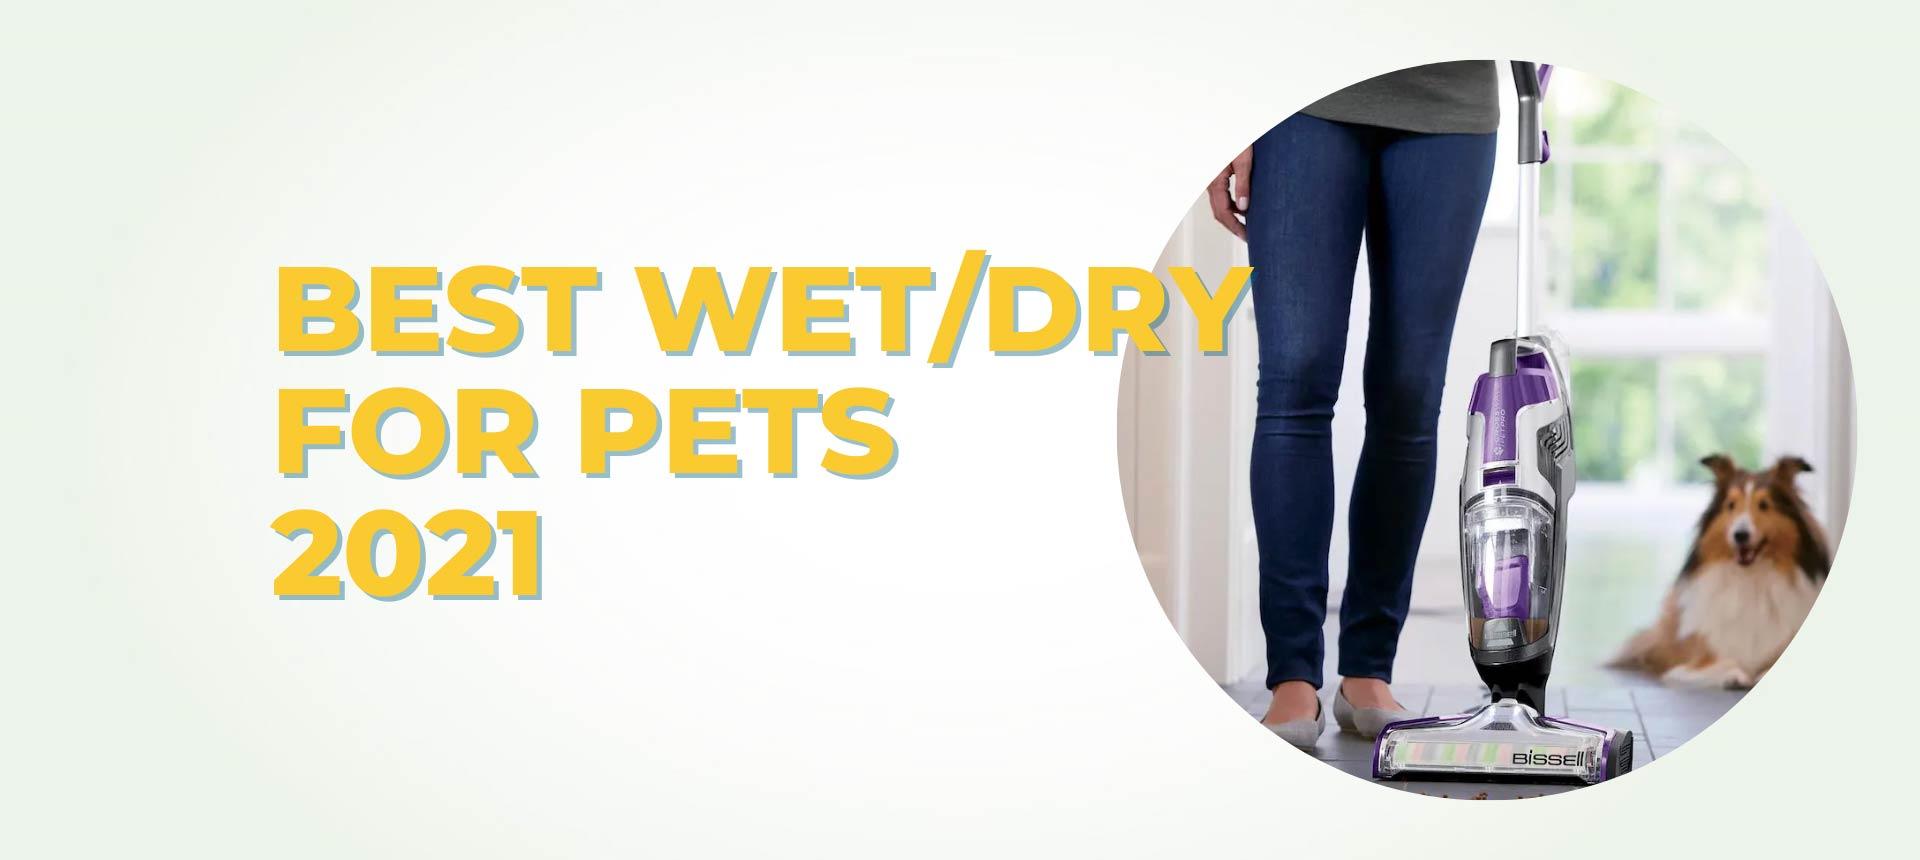 Best Wet/Dry Vacuum For Pets 2021